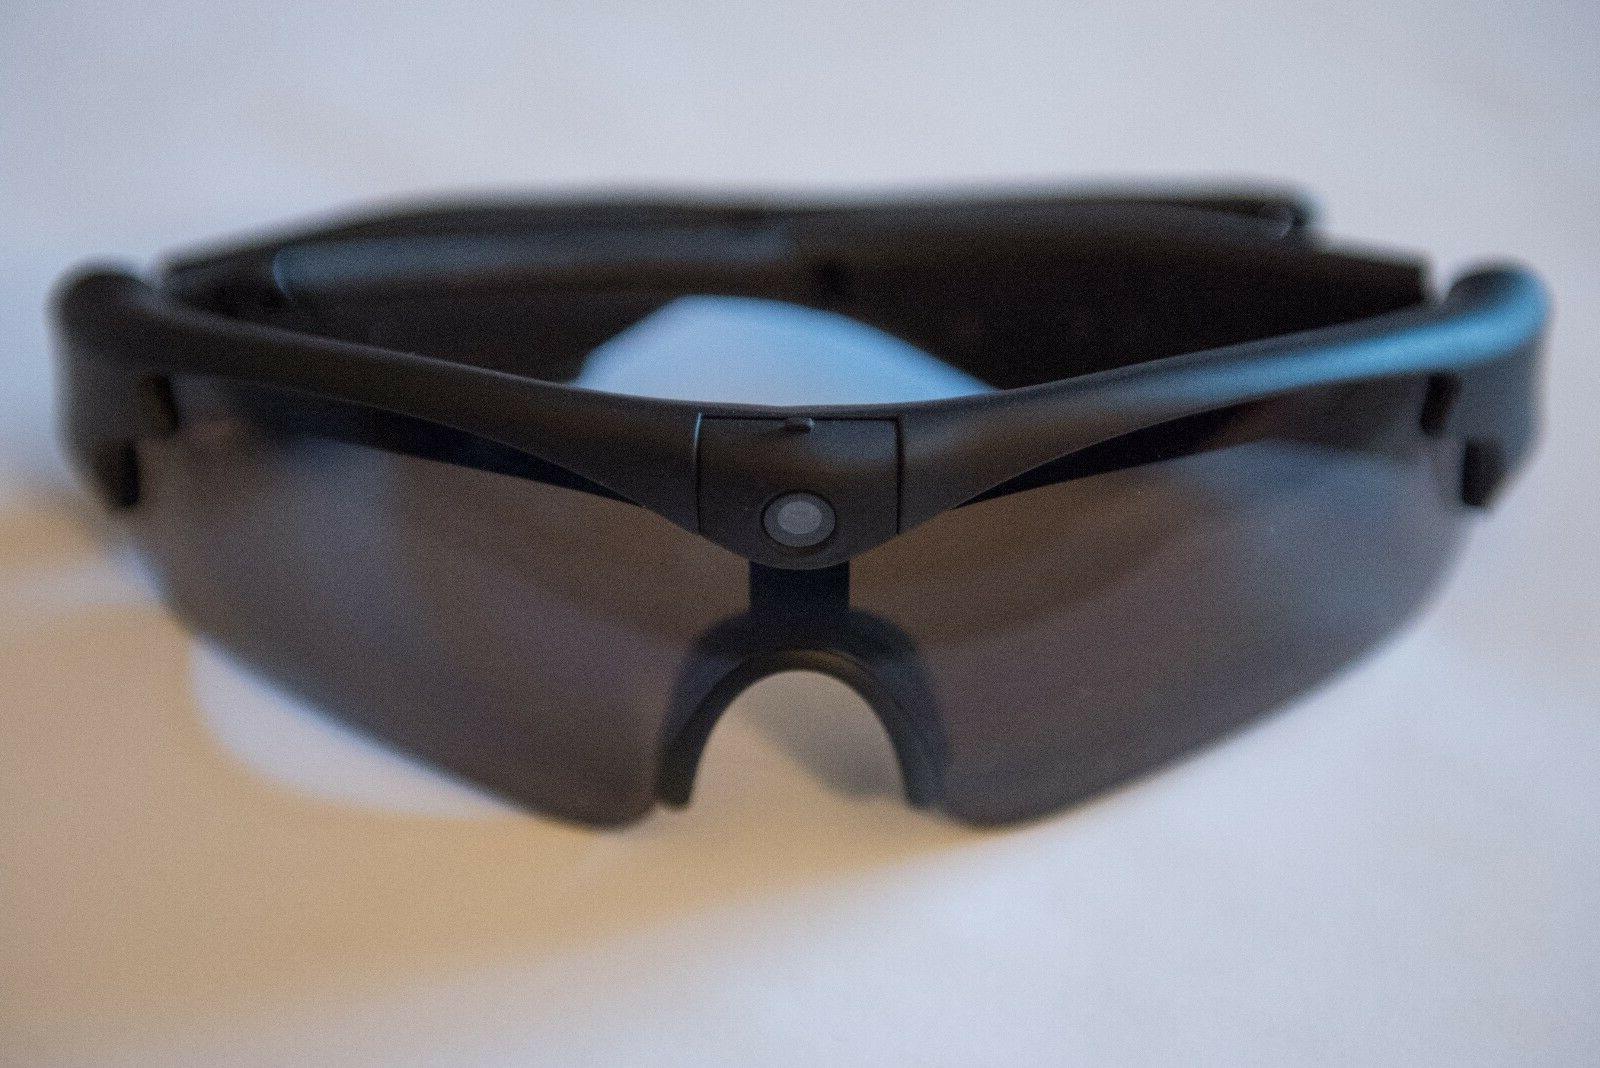 128GB HD Glasses Video Recording Sport DVR